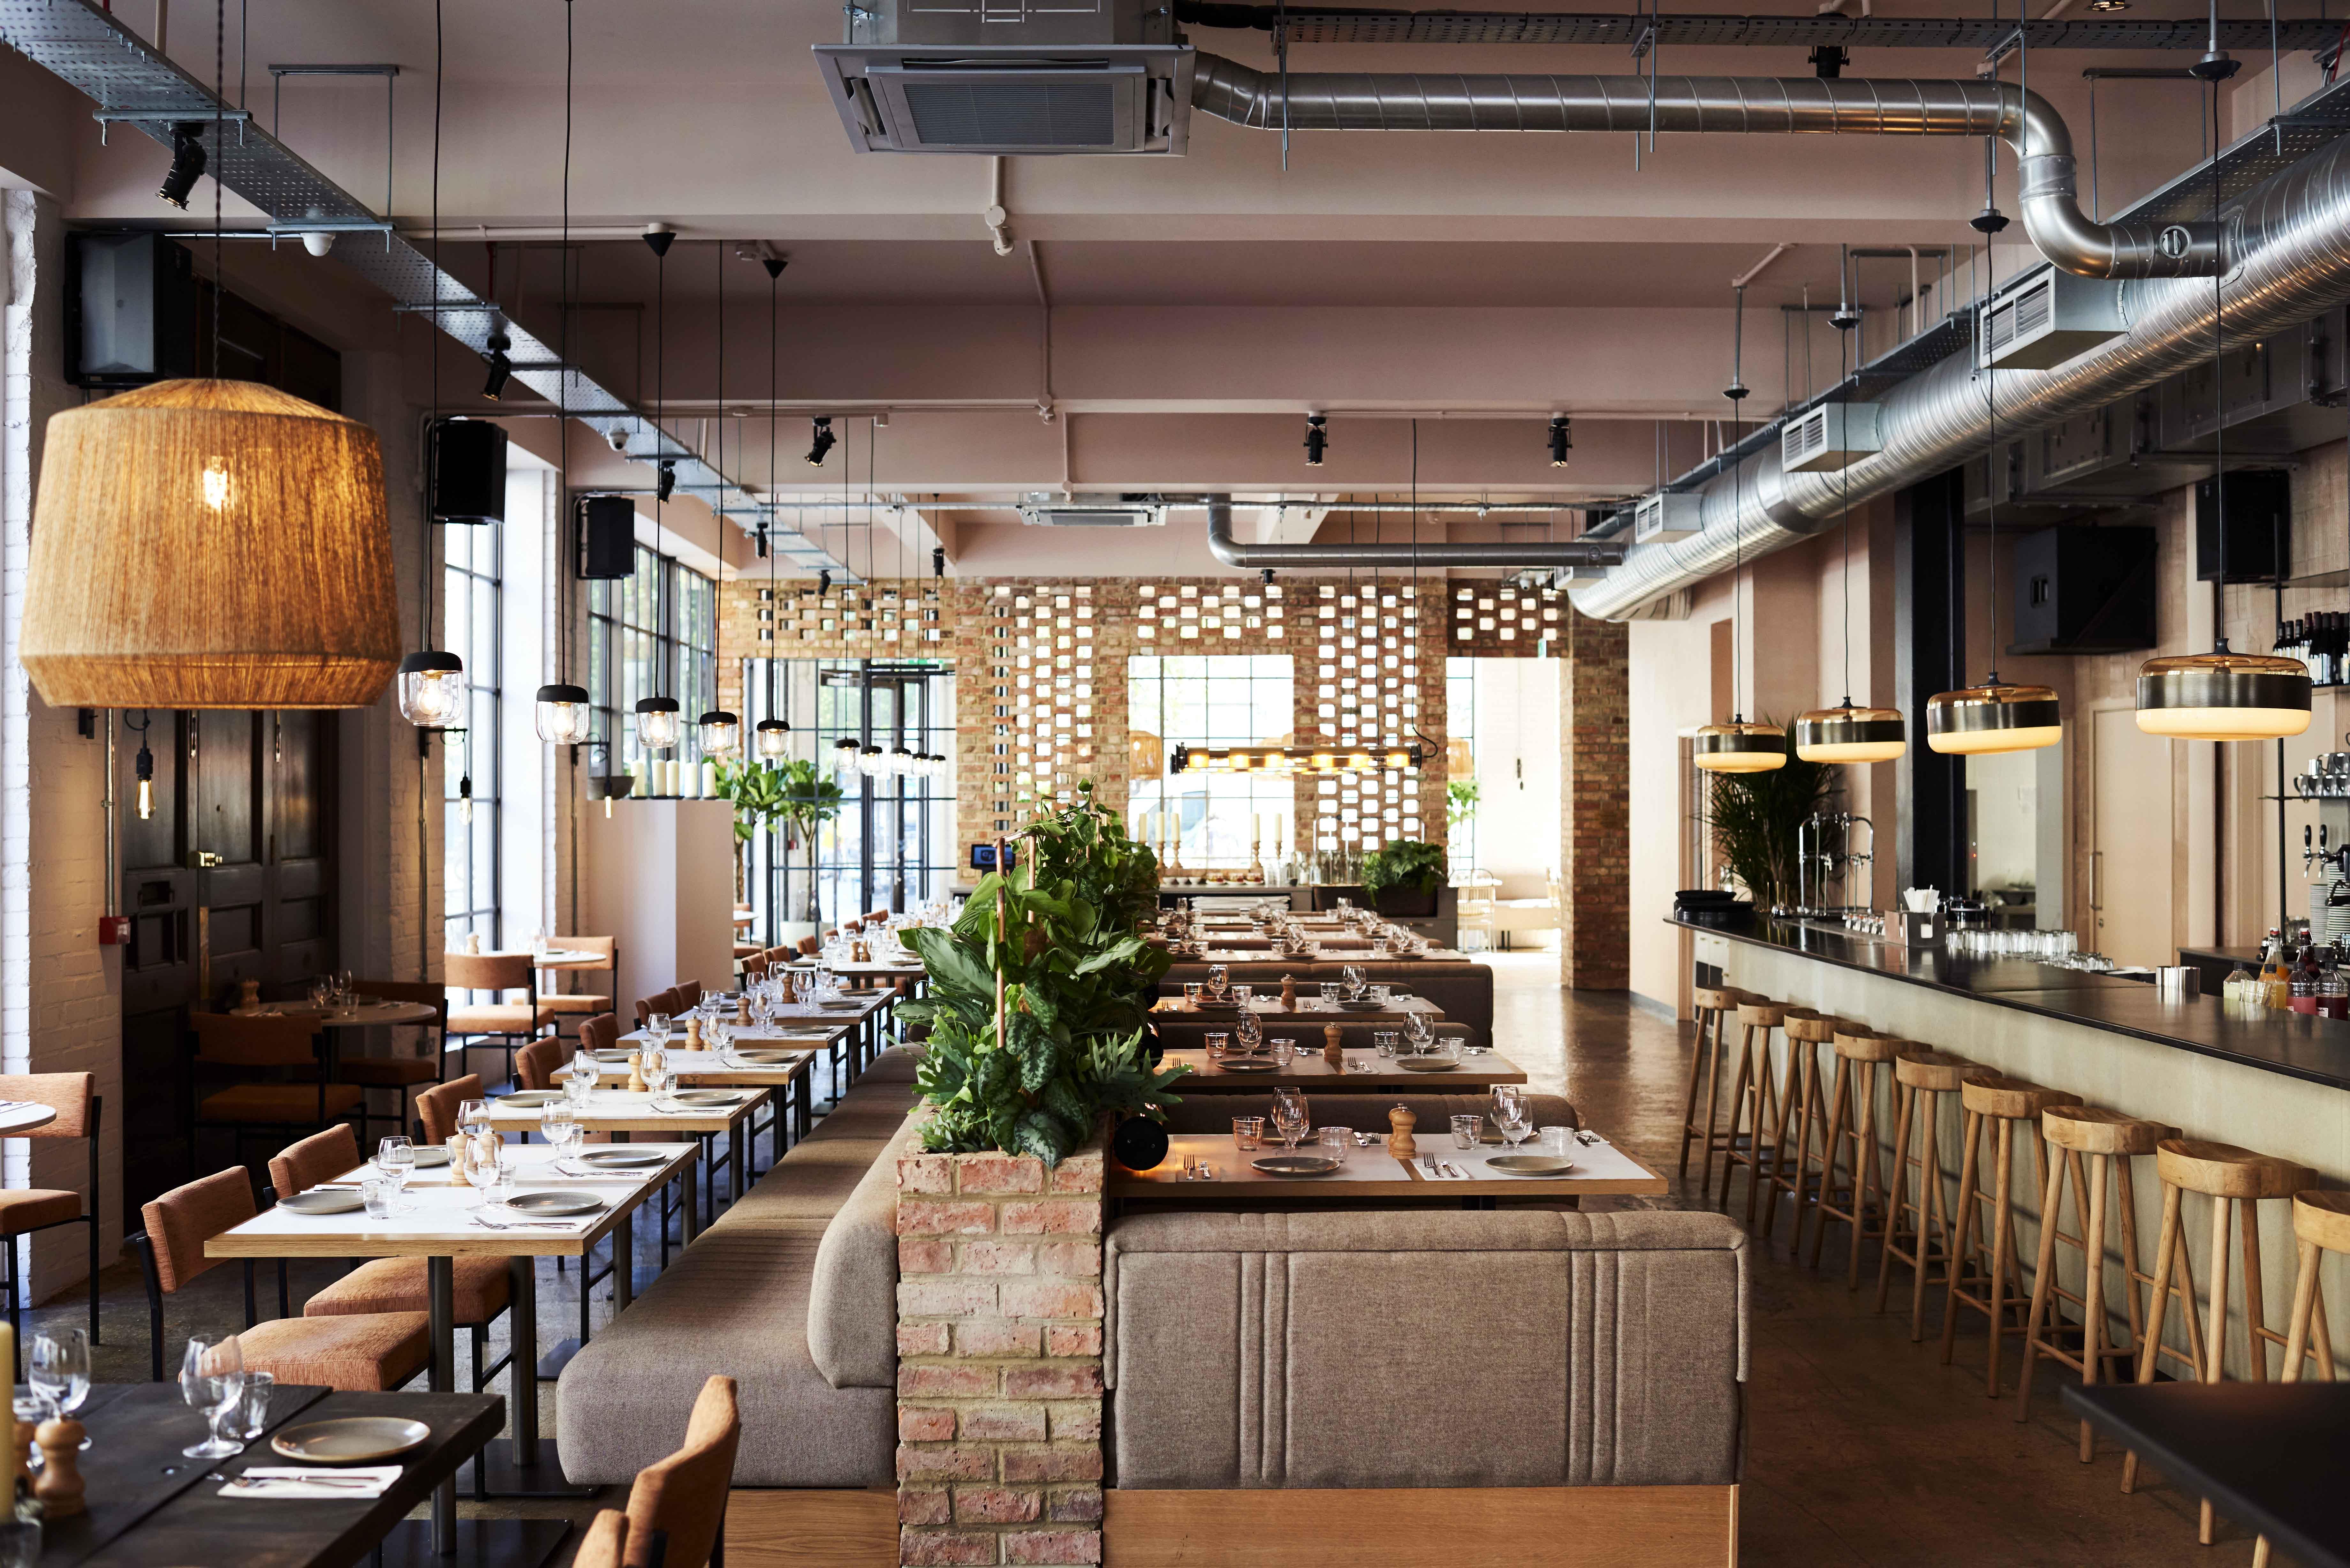 The interior at Caravan Coffee Roasters' new restaurant on Great Portland Street, Fitzrovia, London